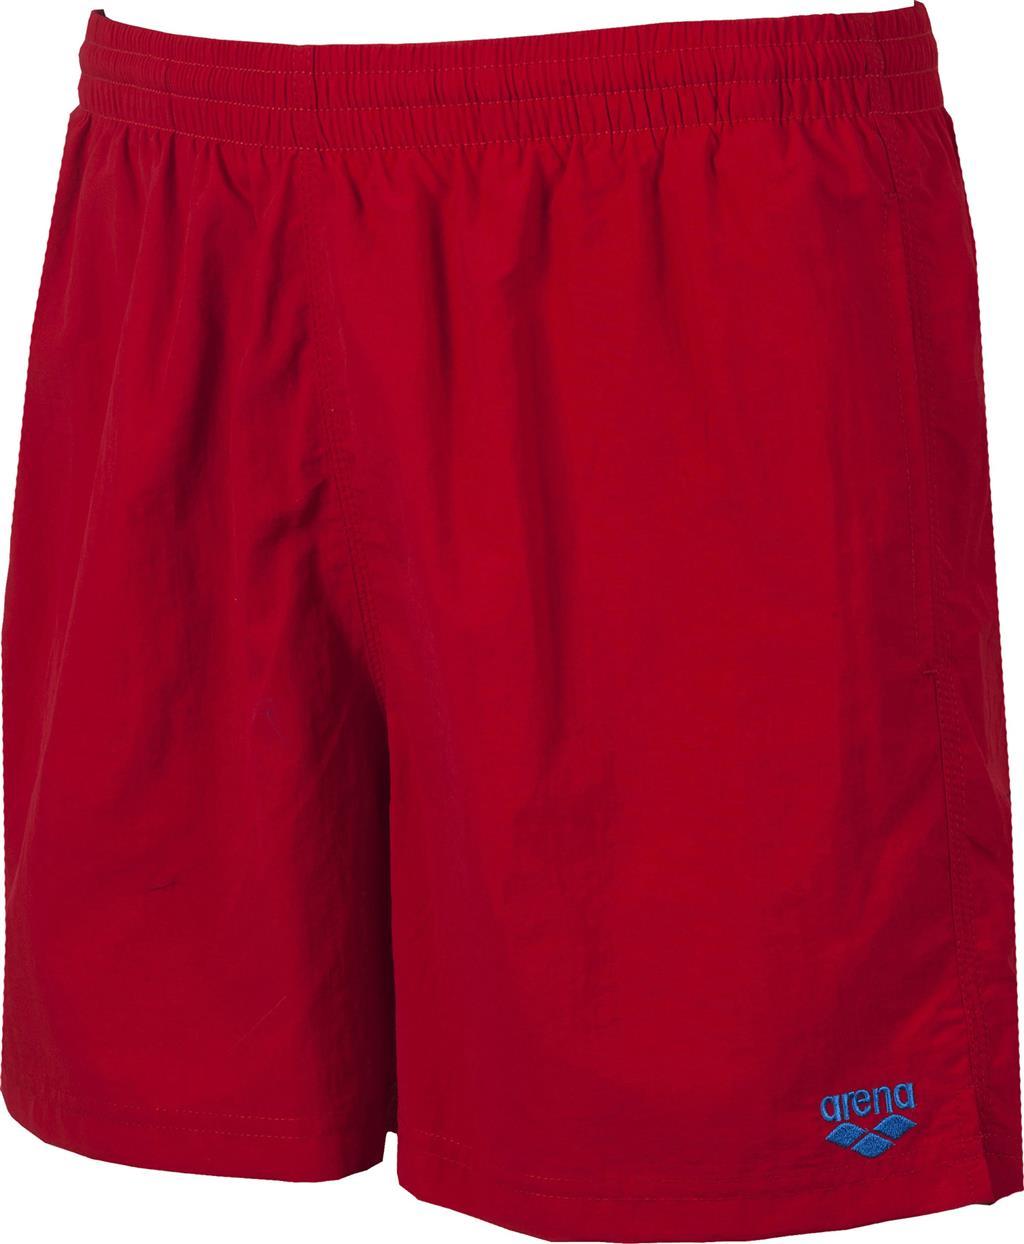 ARENA BADESHORT BOXER    SHINY RED/PIX BLUE